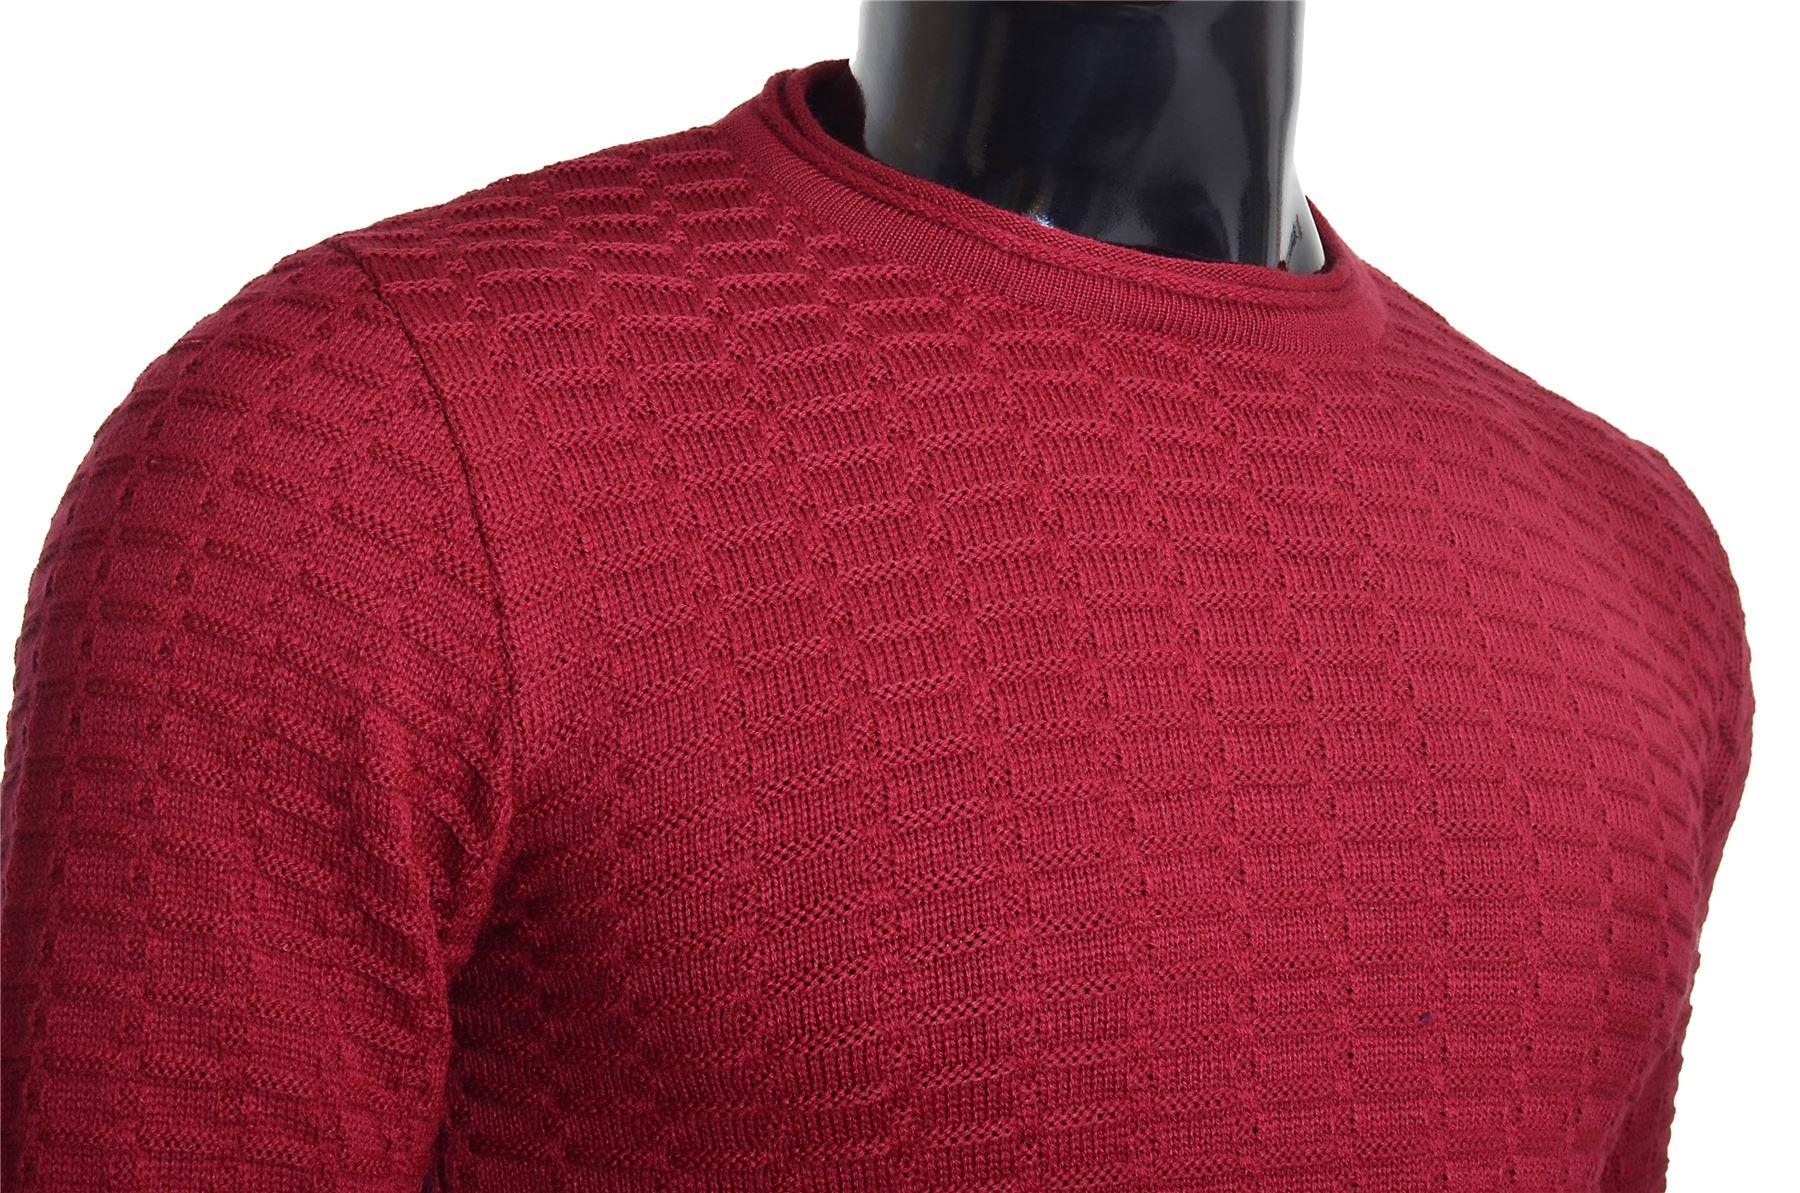 Men-039-s-Jumper-Striped-Knit-Smart-Long-Sleeve-Sweater-Crew-Neck-Top-Slim-Fitness thumbnail 5